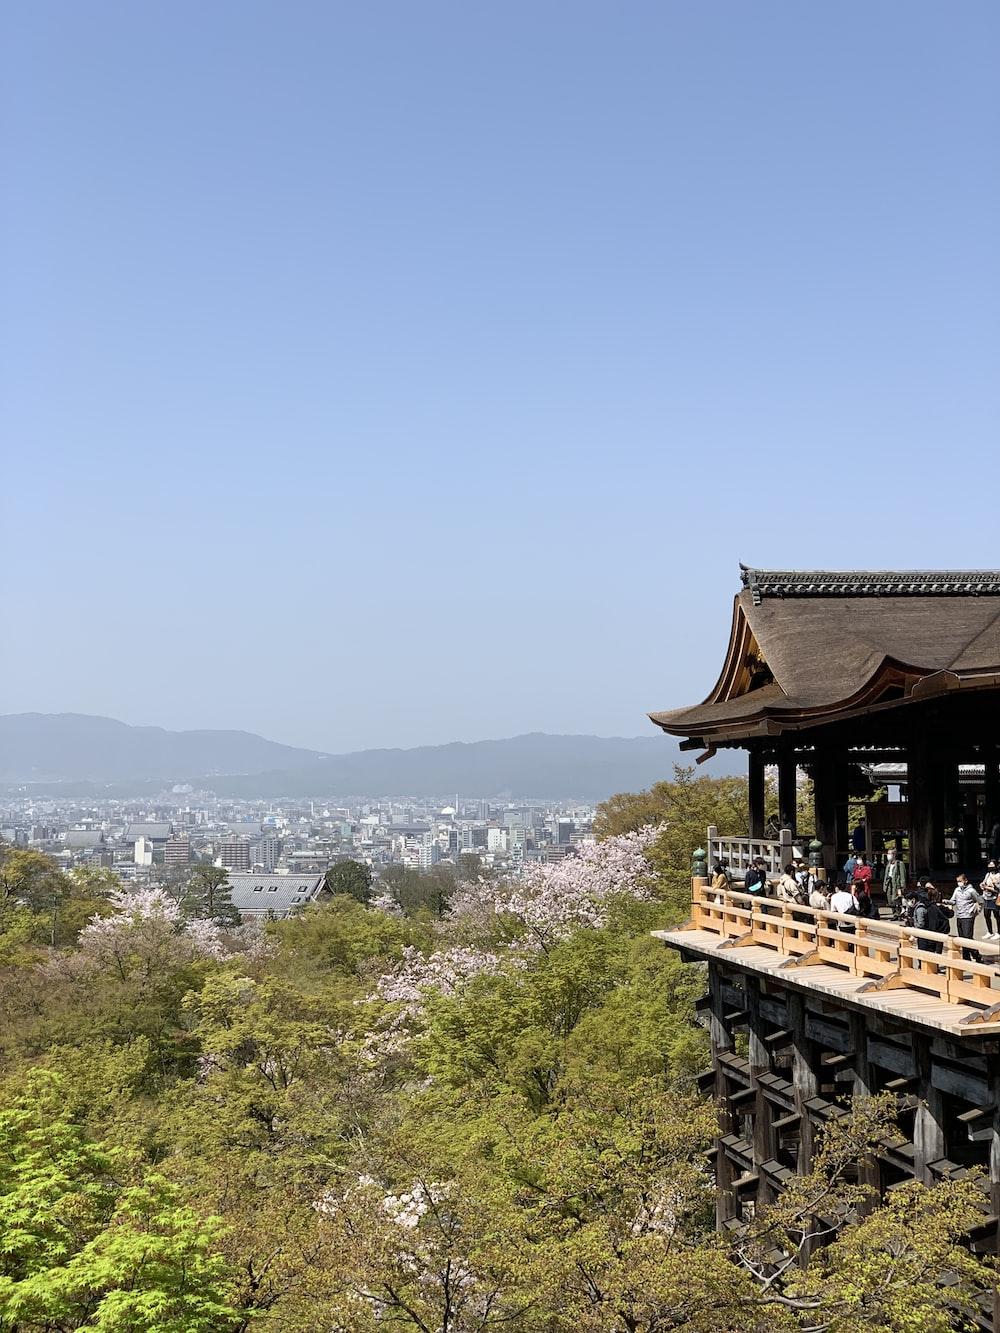 brown wooden gazebo on top of mountain during daytime